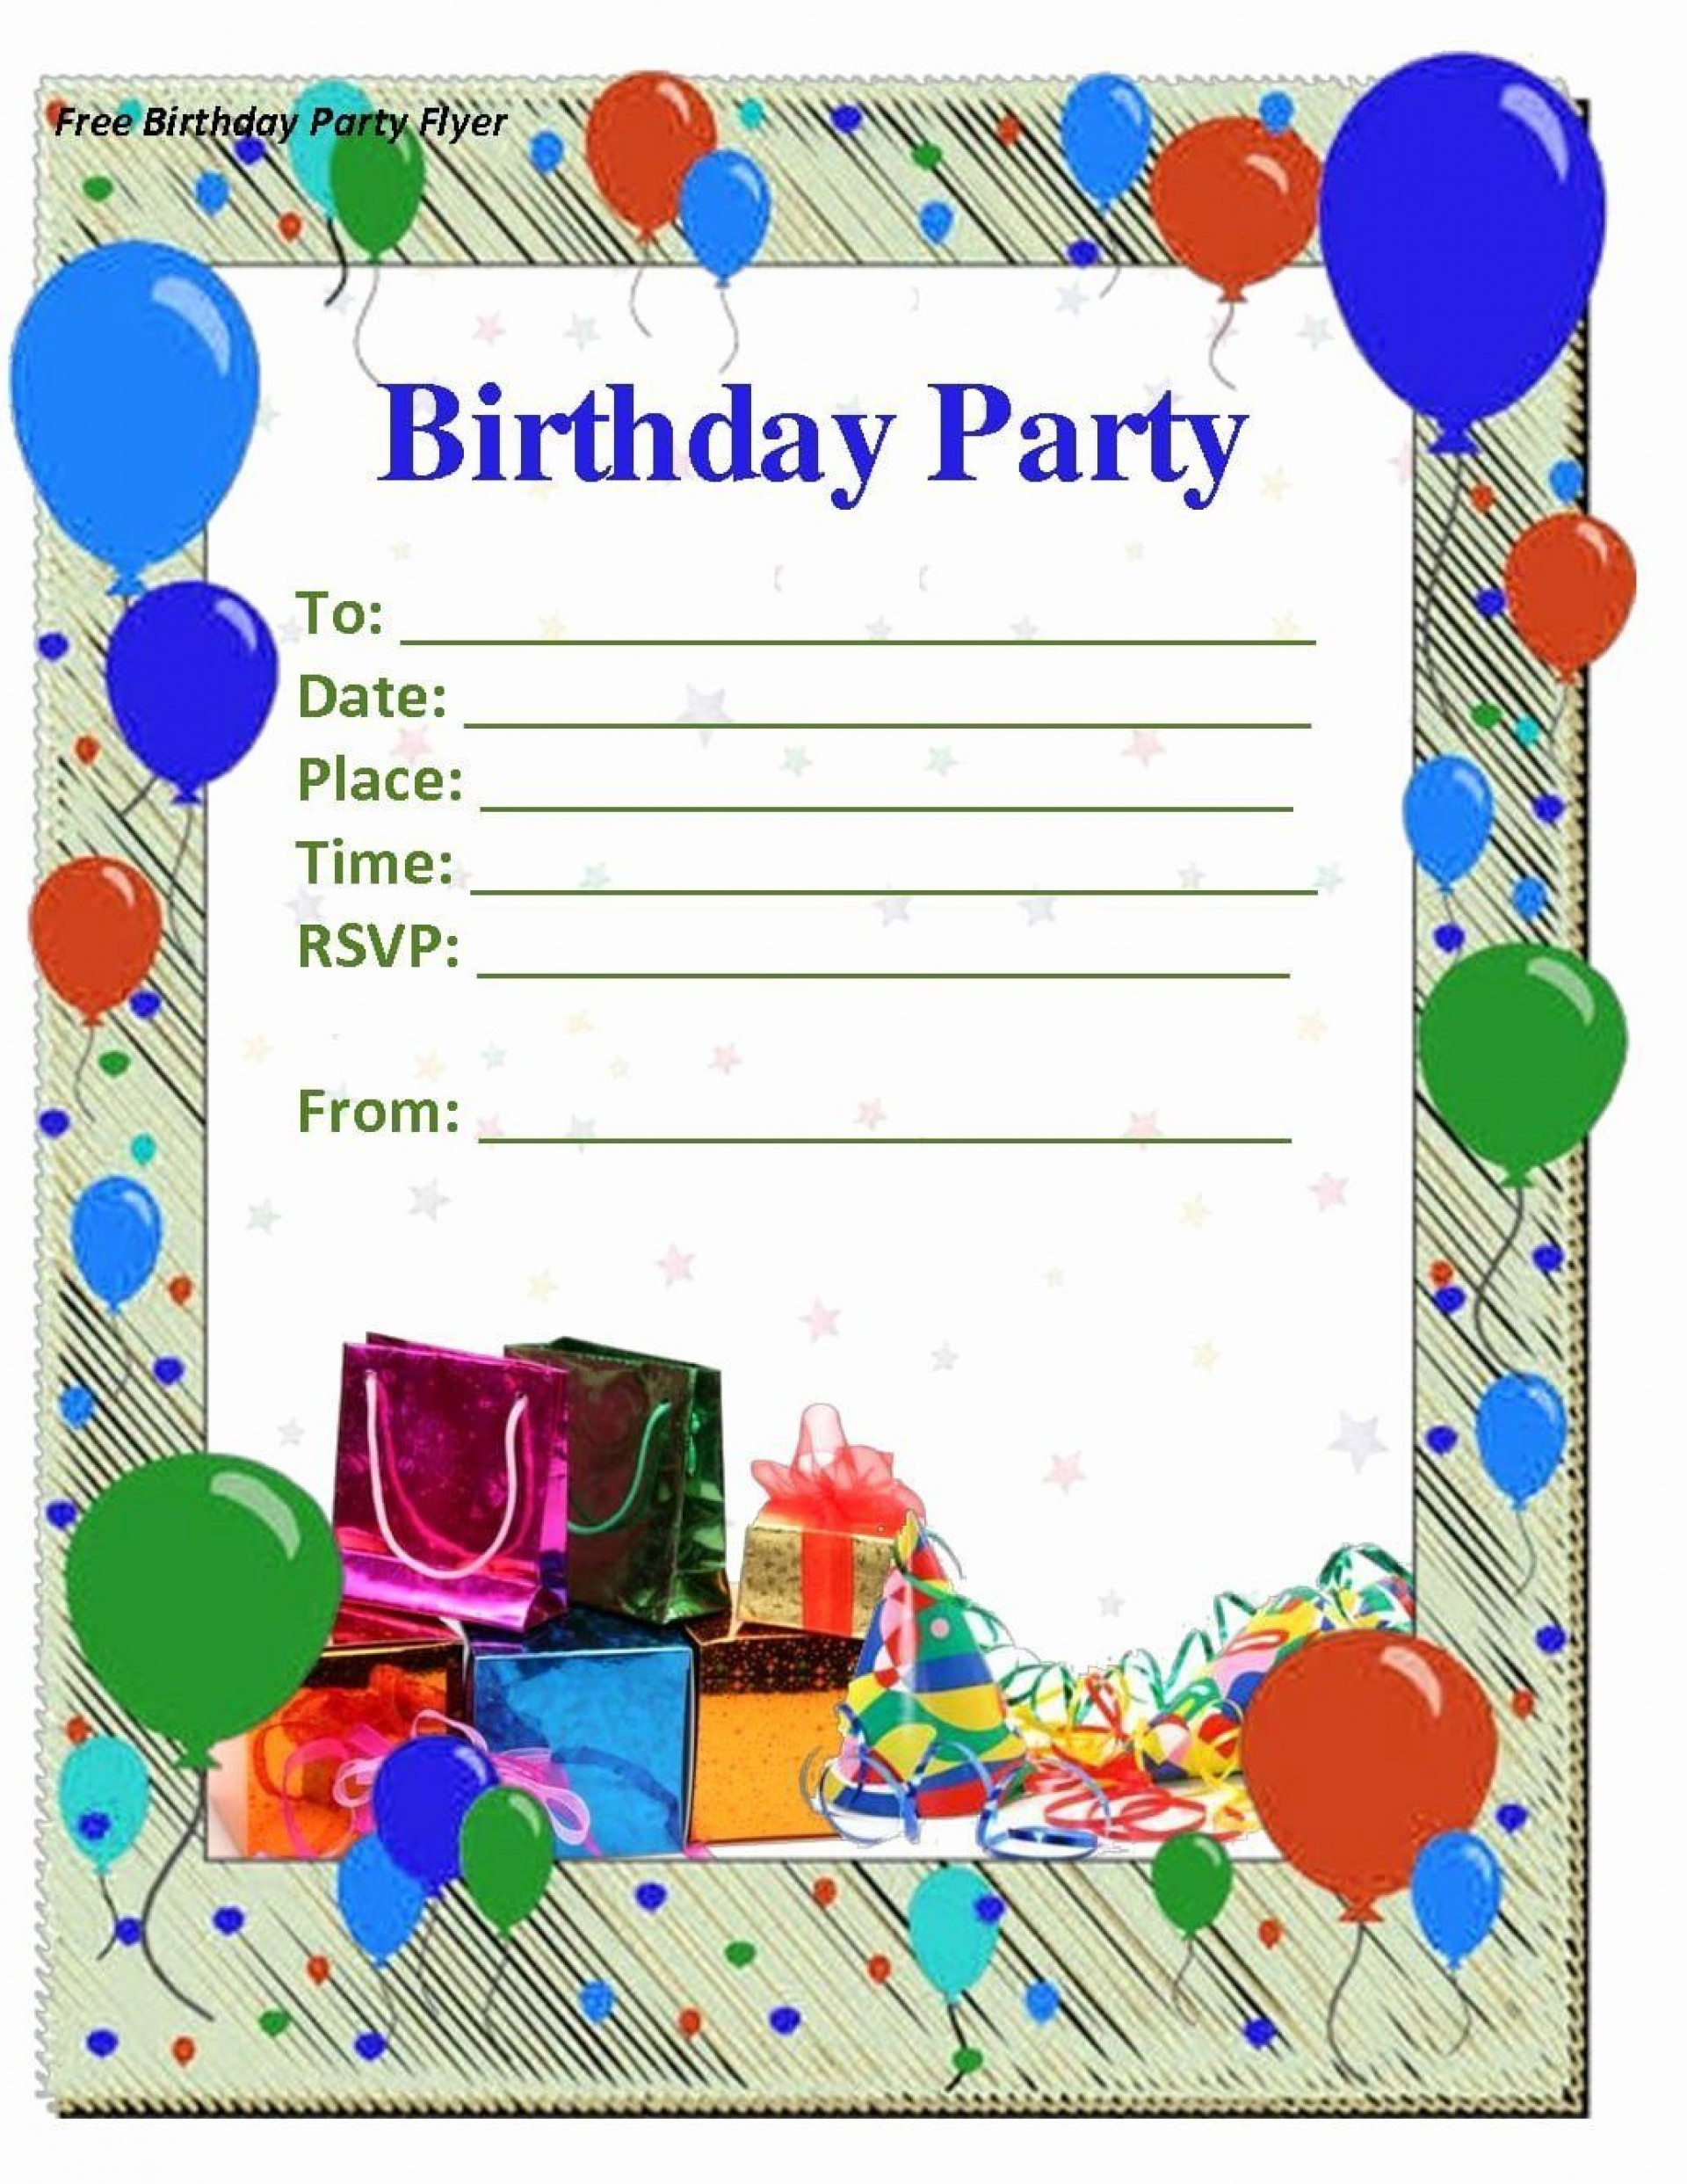 001 Amazing Birthday Invitation Template Word 2020 Highest Quality 1920